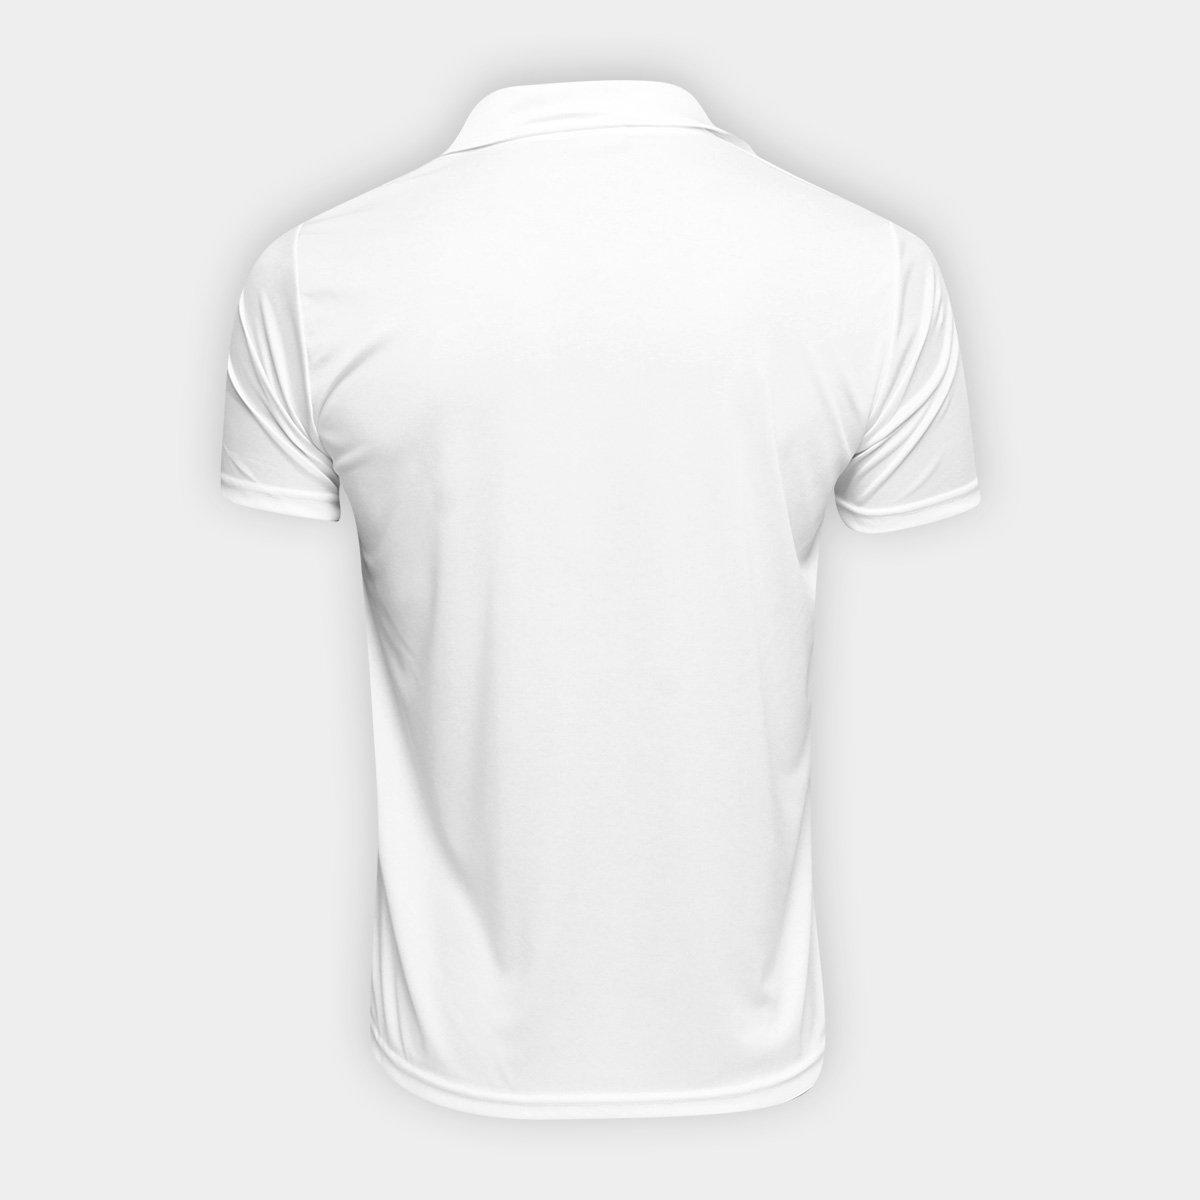 Camisa Santos 2010 s nº Masculina - Branco - Compre Agora  faa77104bb0b2